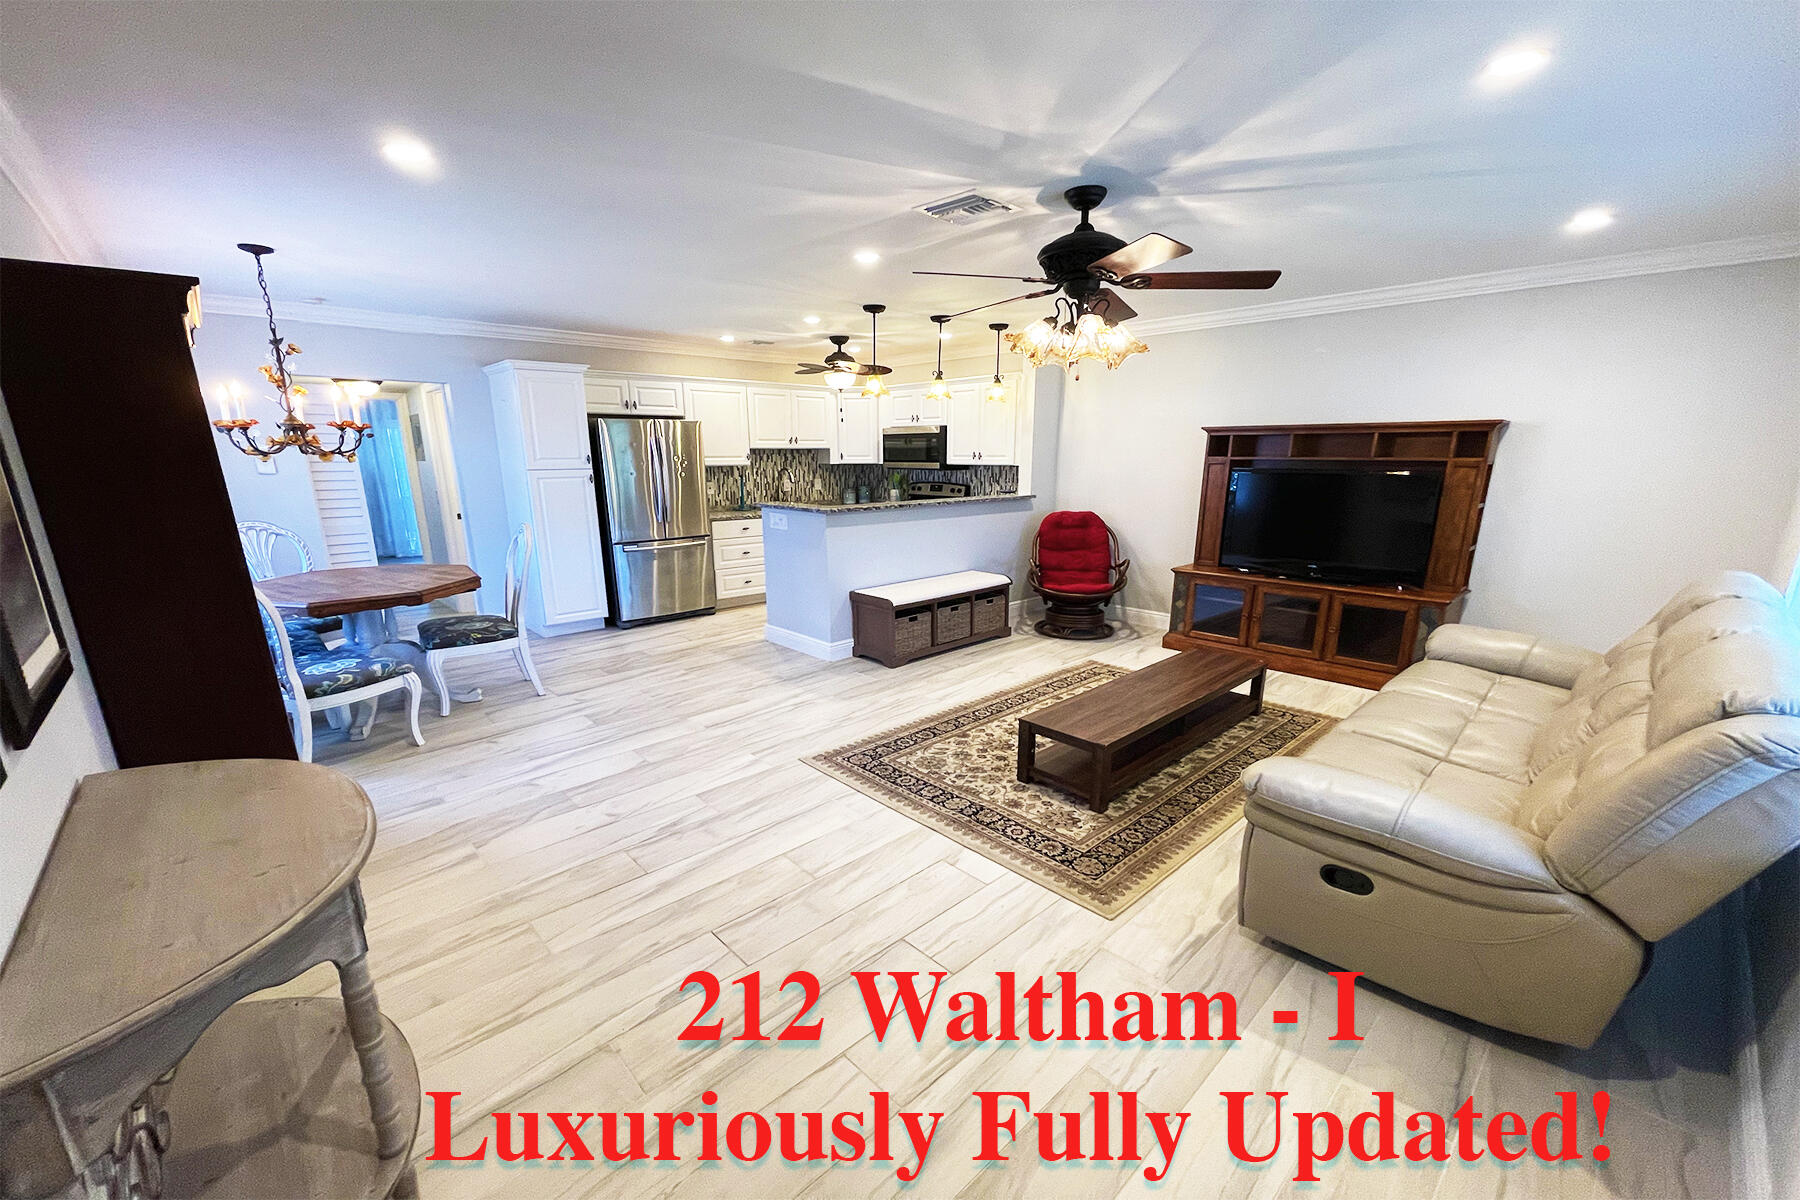 212 Waltham-i